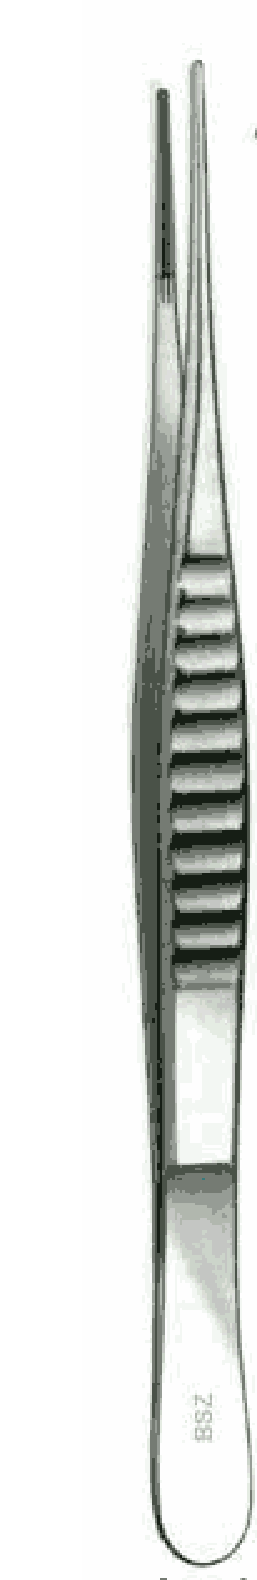 BSZ - 4014